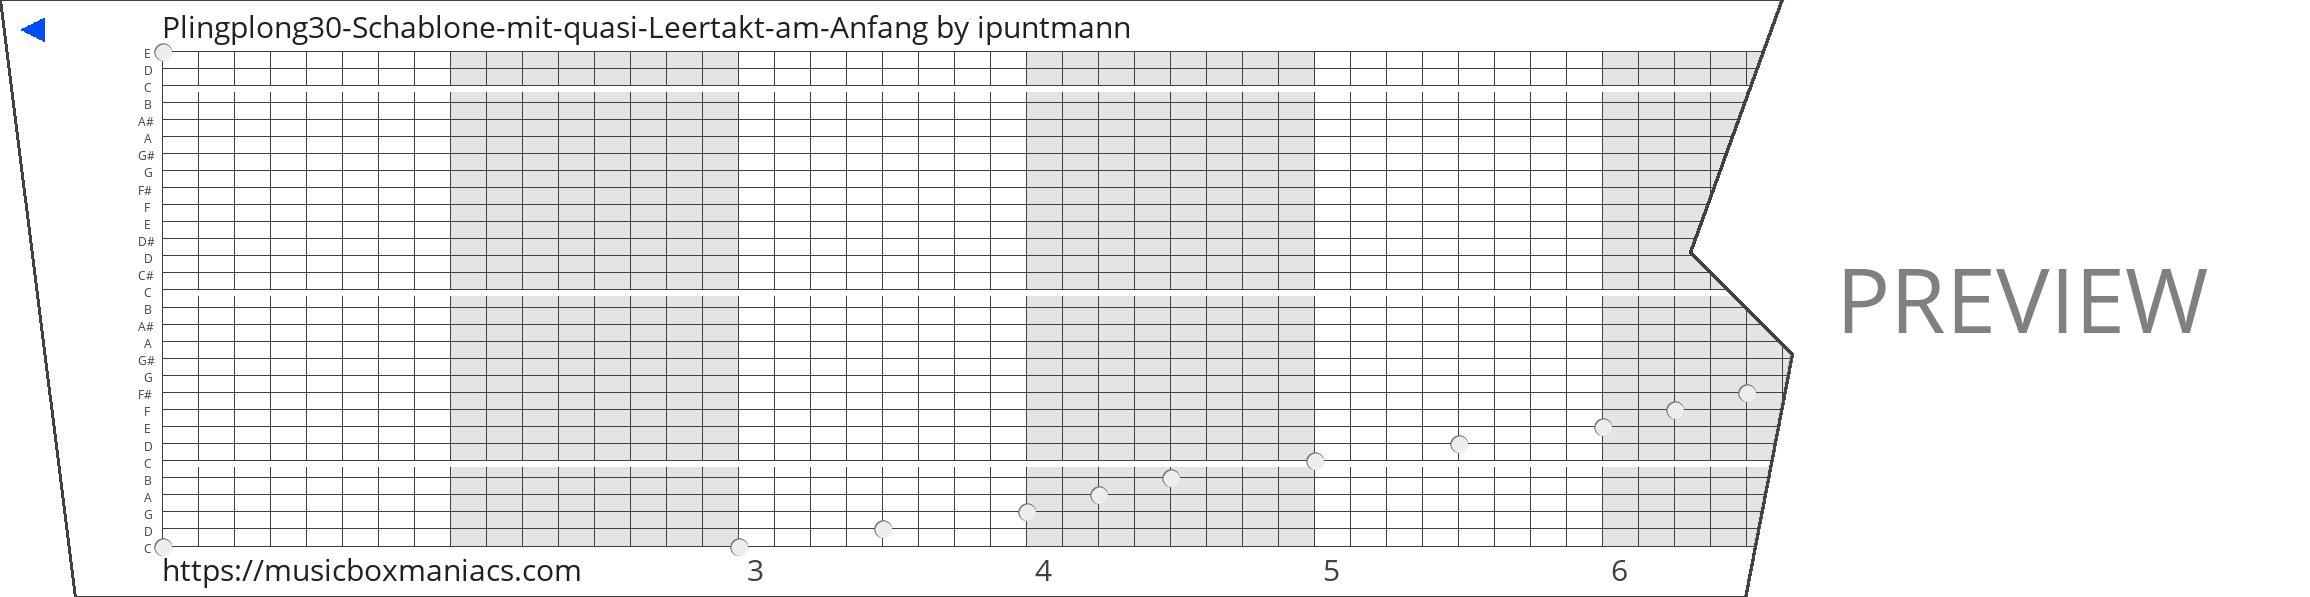 Plingplong30-Schablone-mit-quasi-Leertakt-am-Anfang 30 note music box paper strip